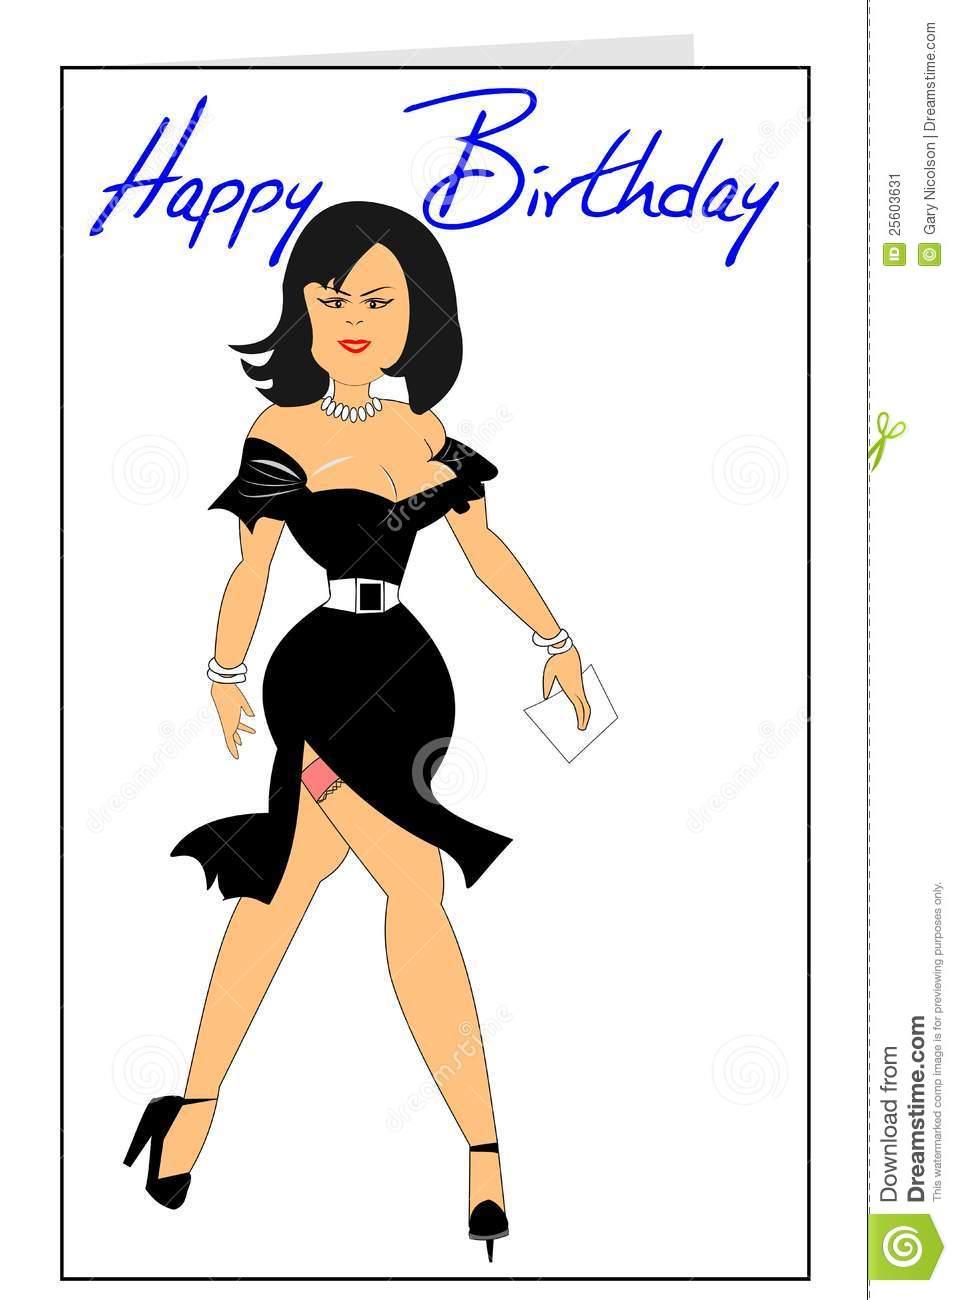 Carte anniversaire homme sexy black